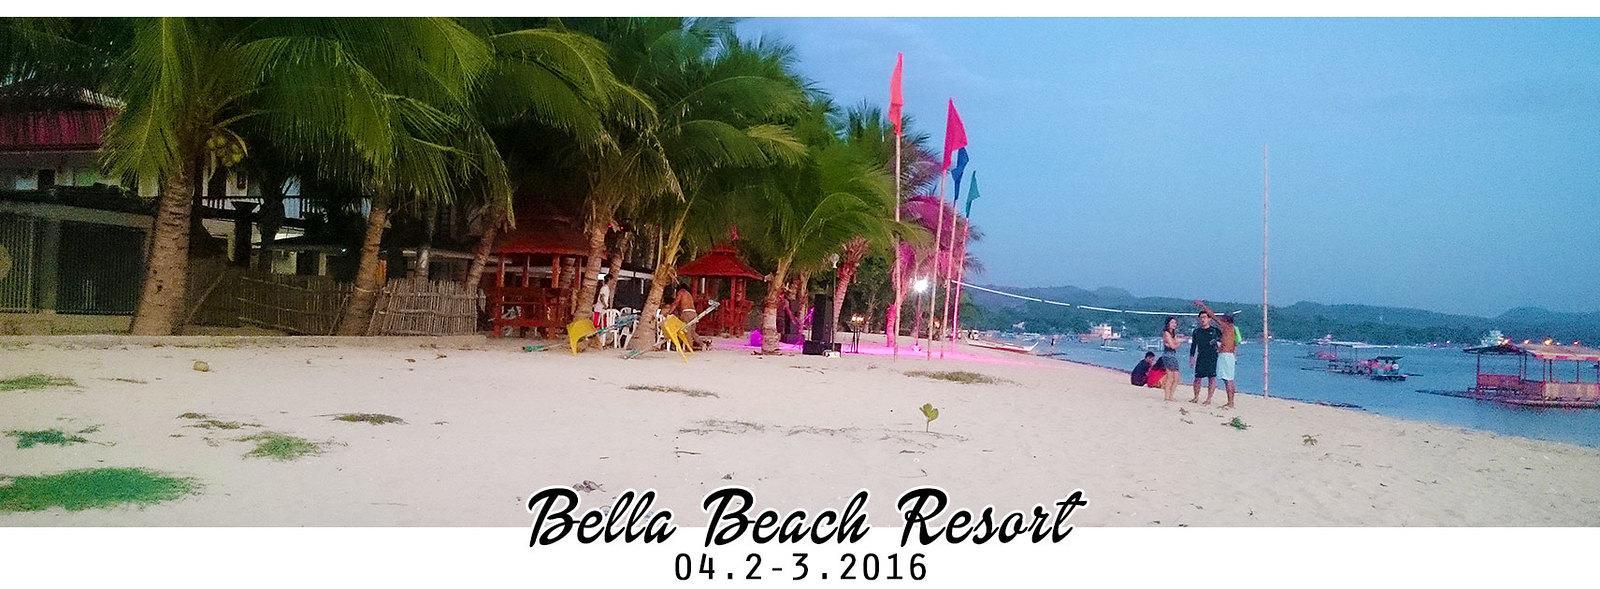 Bella Beach Resort 2016 Bella Beach Resort